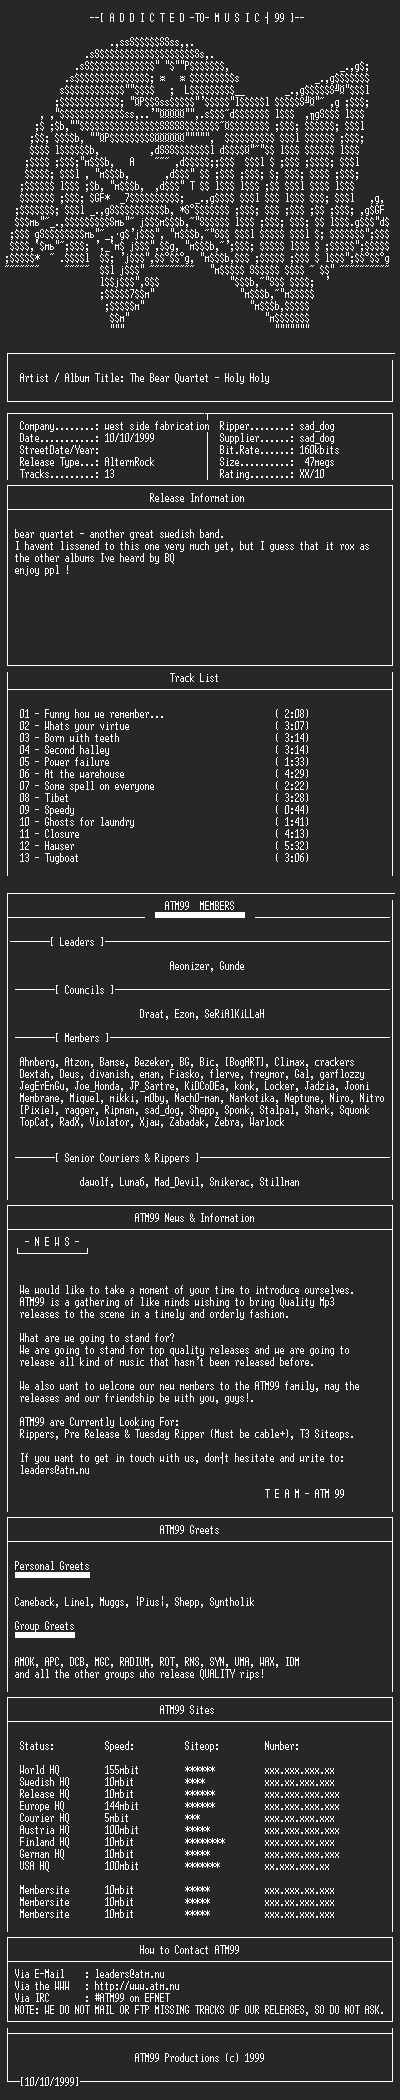 NFO file for The_Bear_Quartet_-_Holy_Holy_(1995)-ATM99